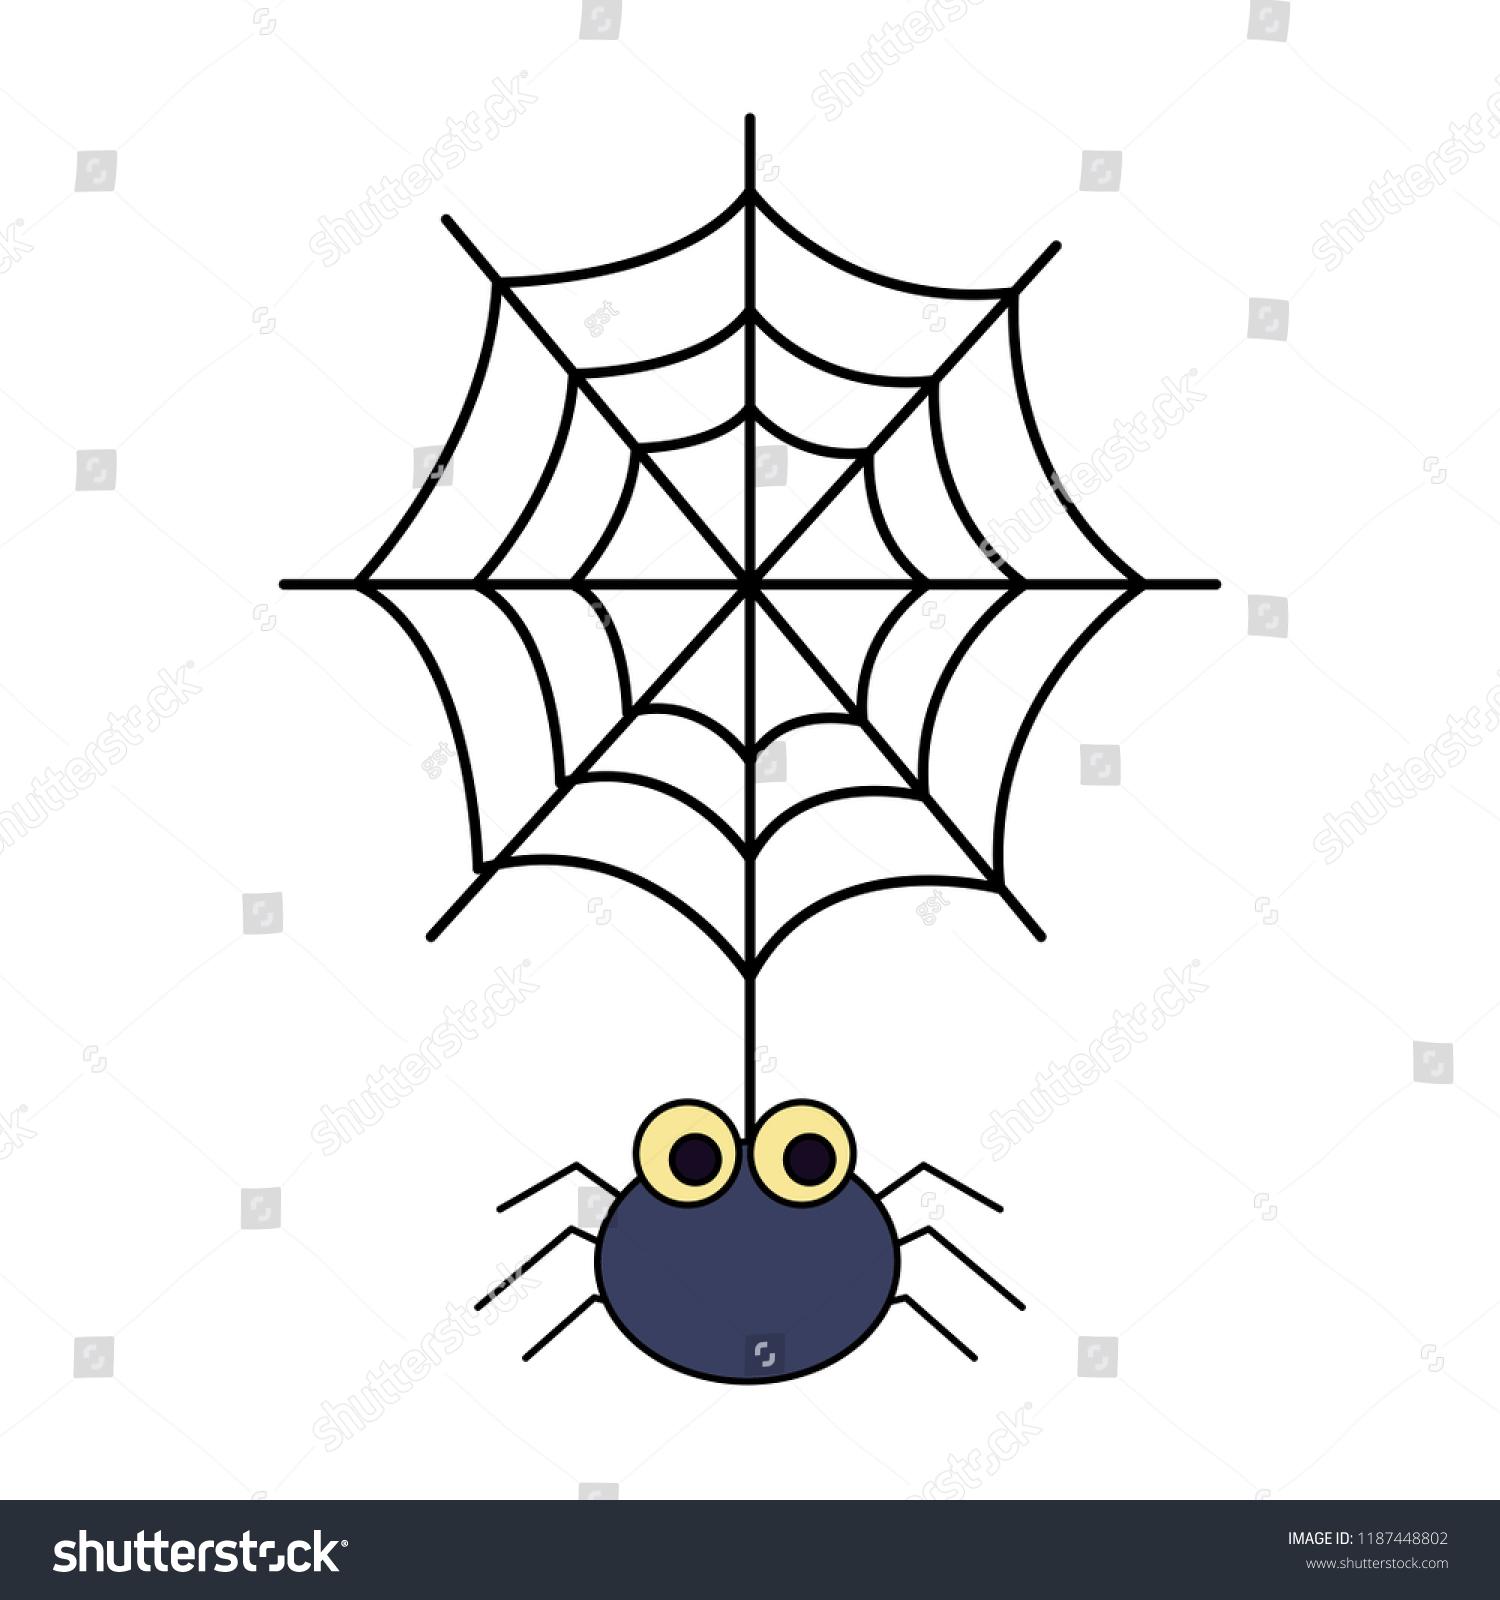 halloween spider spiderweb isolated icon stock vector (royalty free